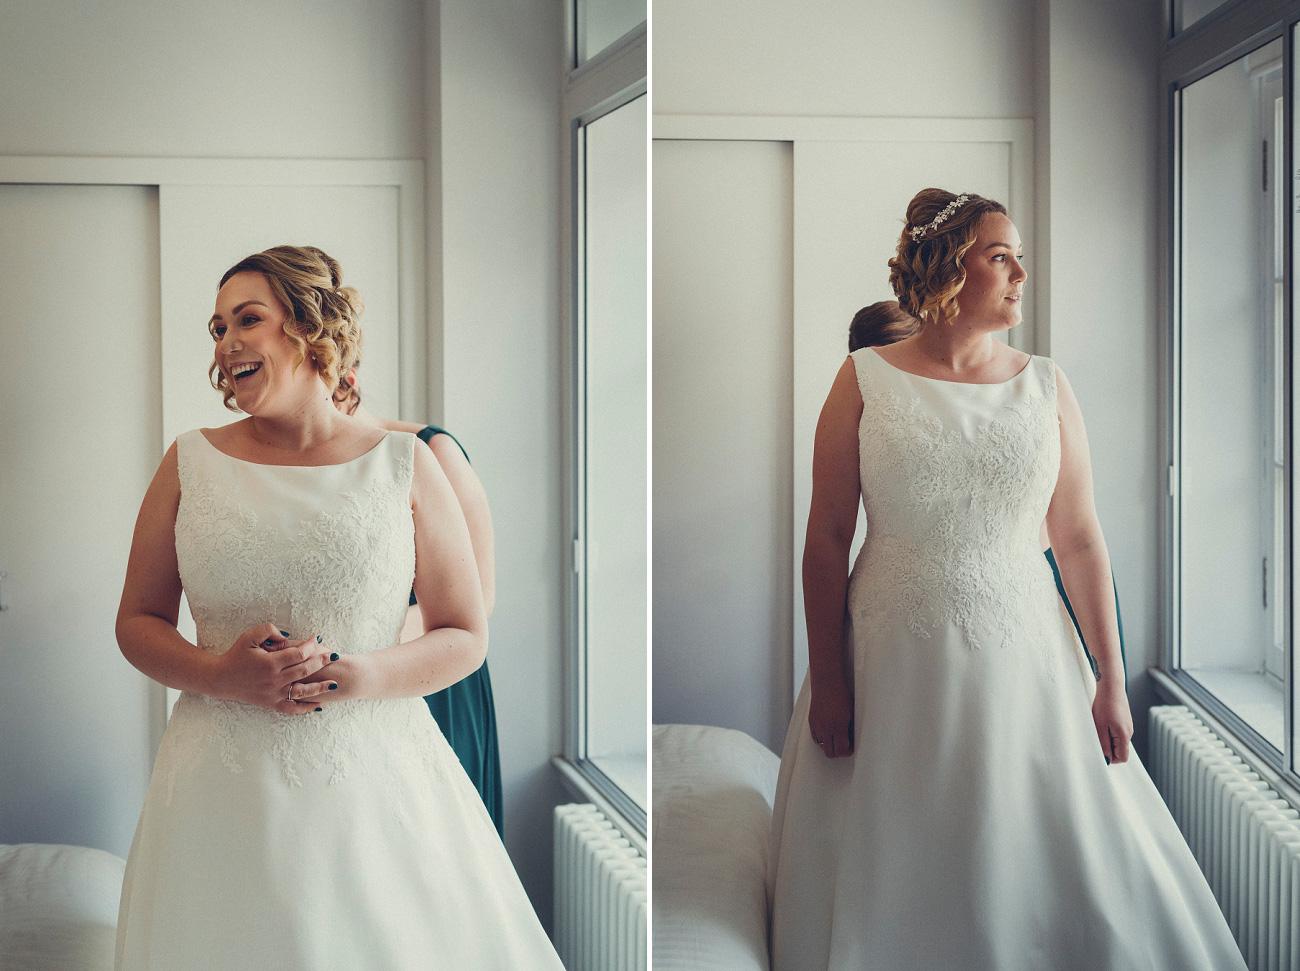 relaxed bridal wedding preparations natural wedding photographer glasgow scotland